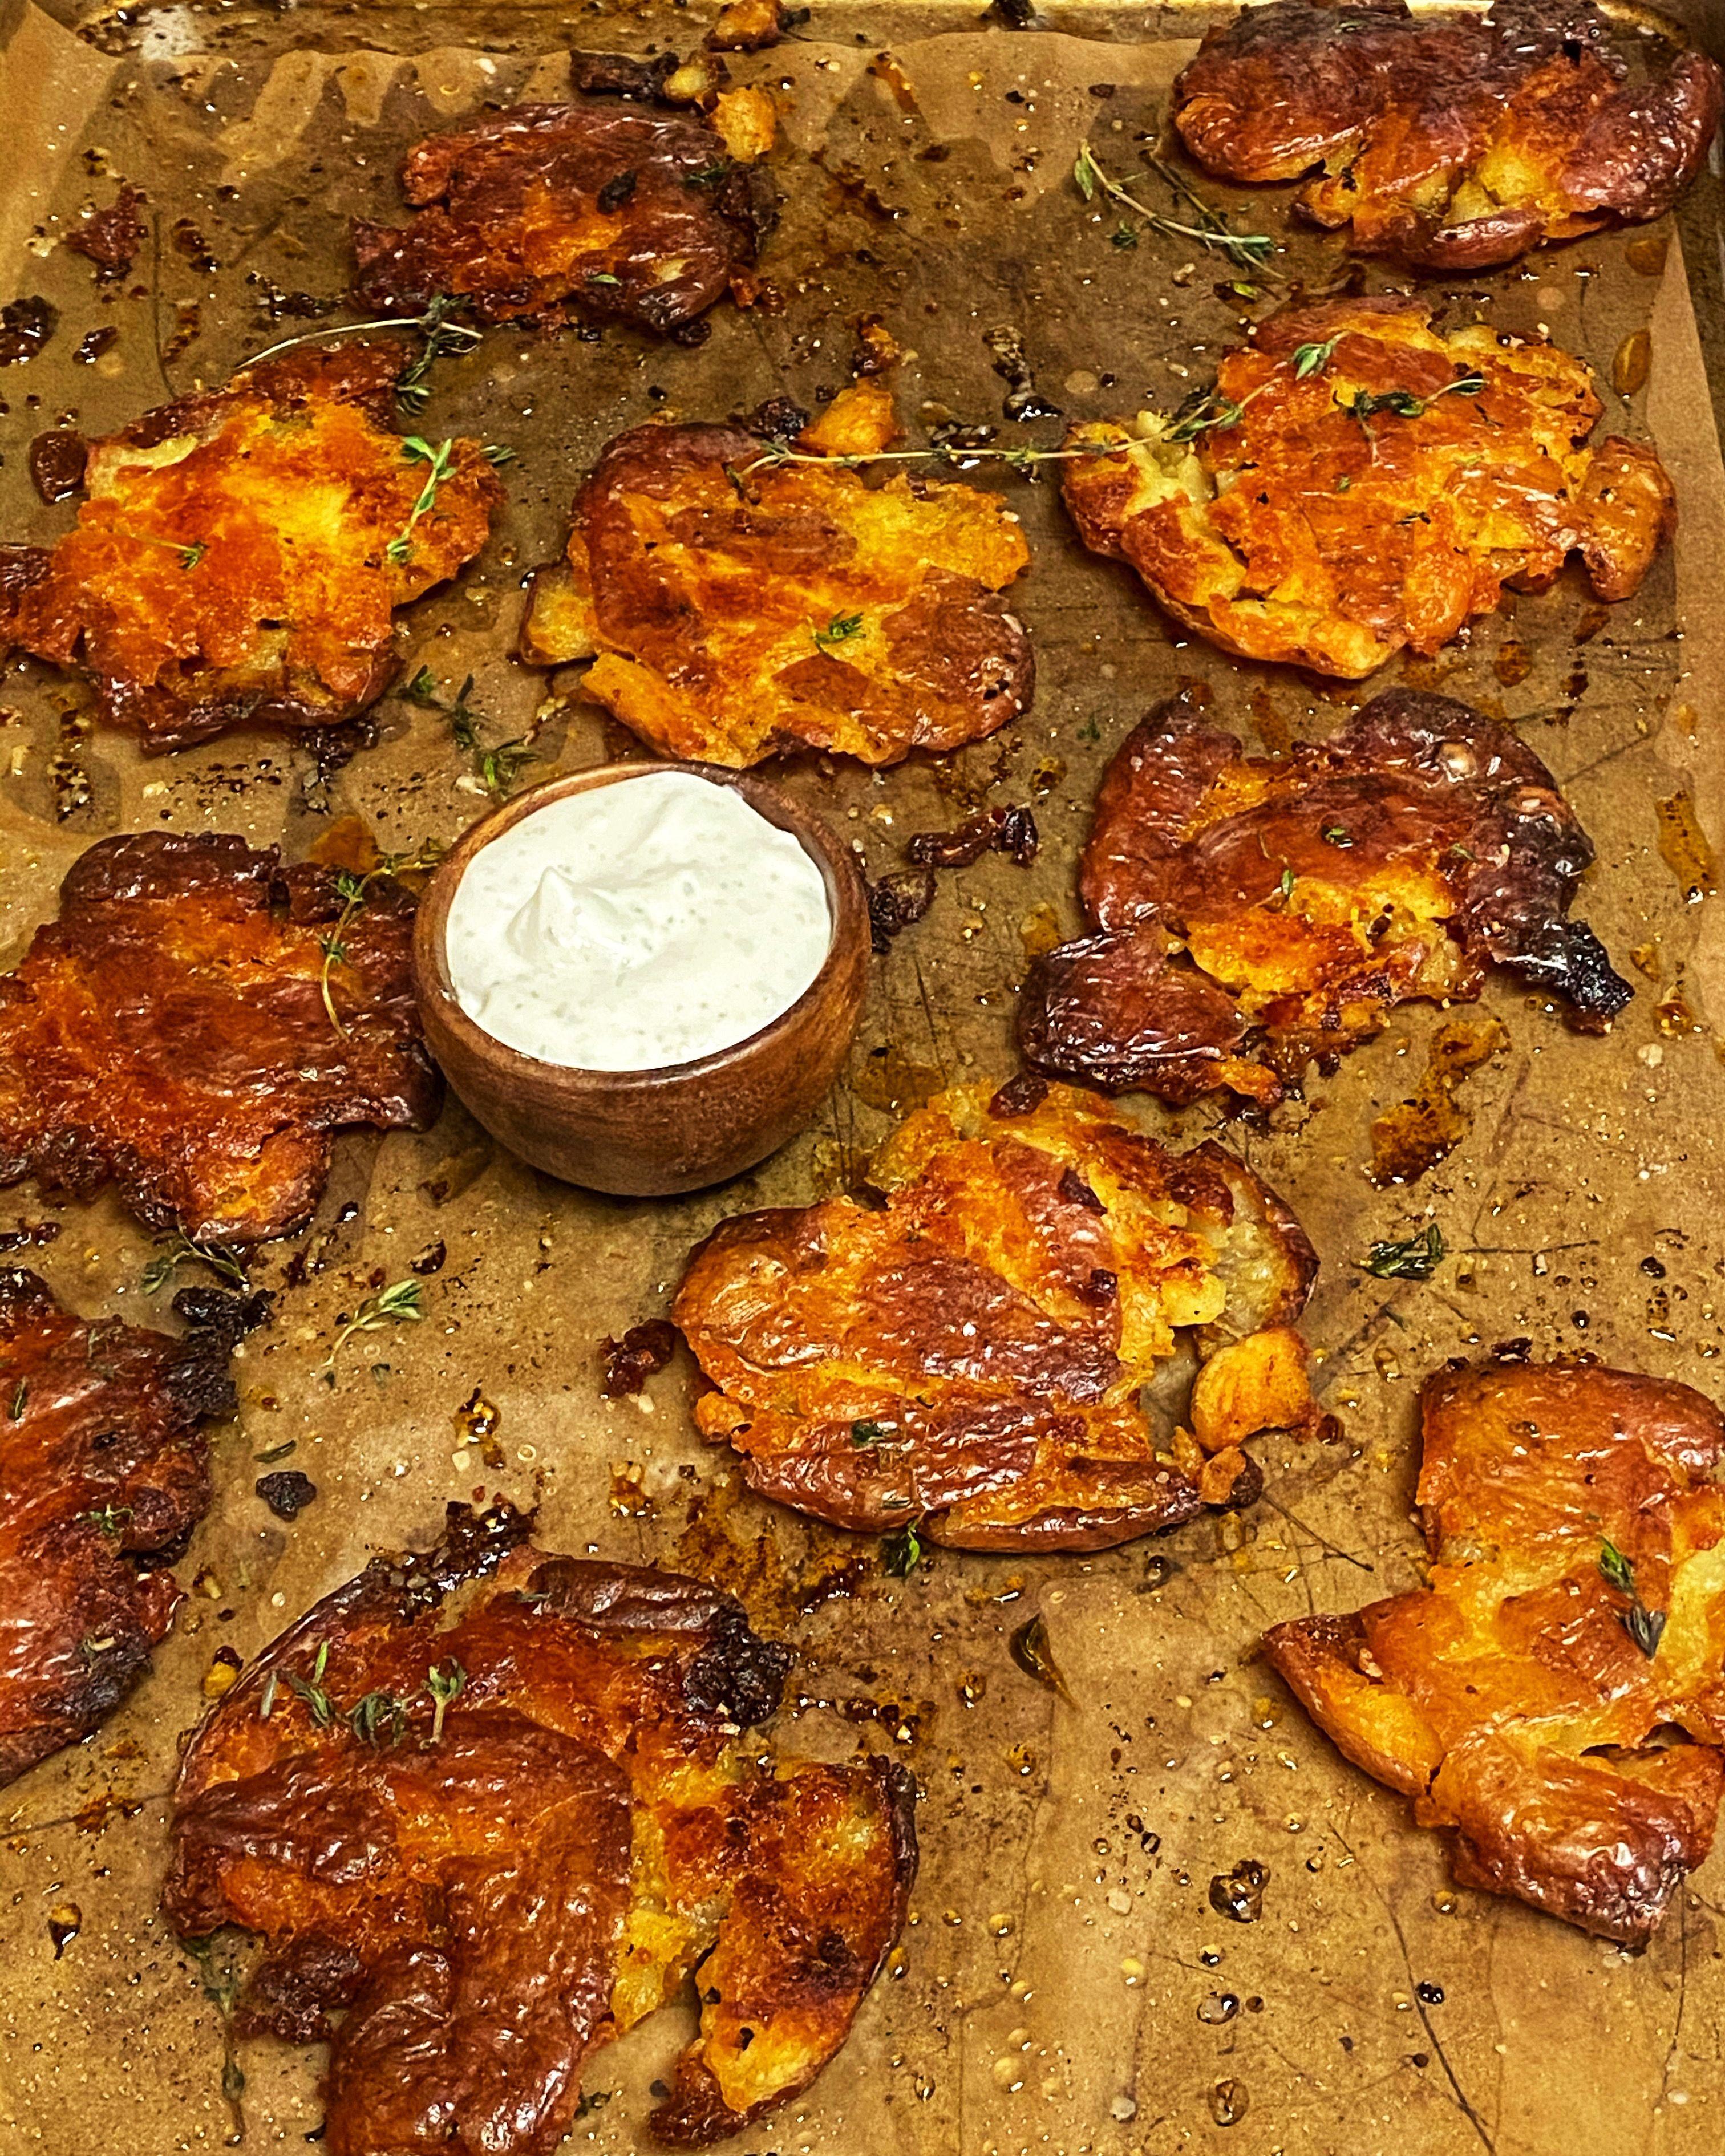 #potatoes #sidedish #easyrecipe #crispy #foodie #homecooking #yummy #simplerecipes